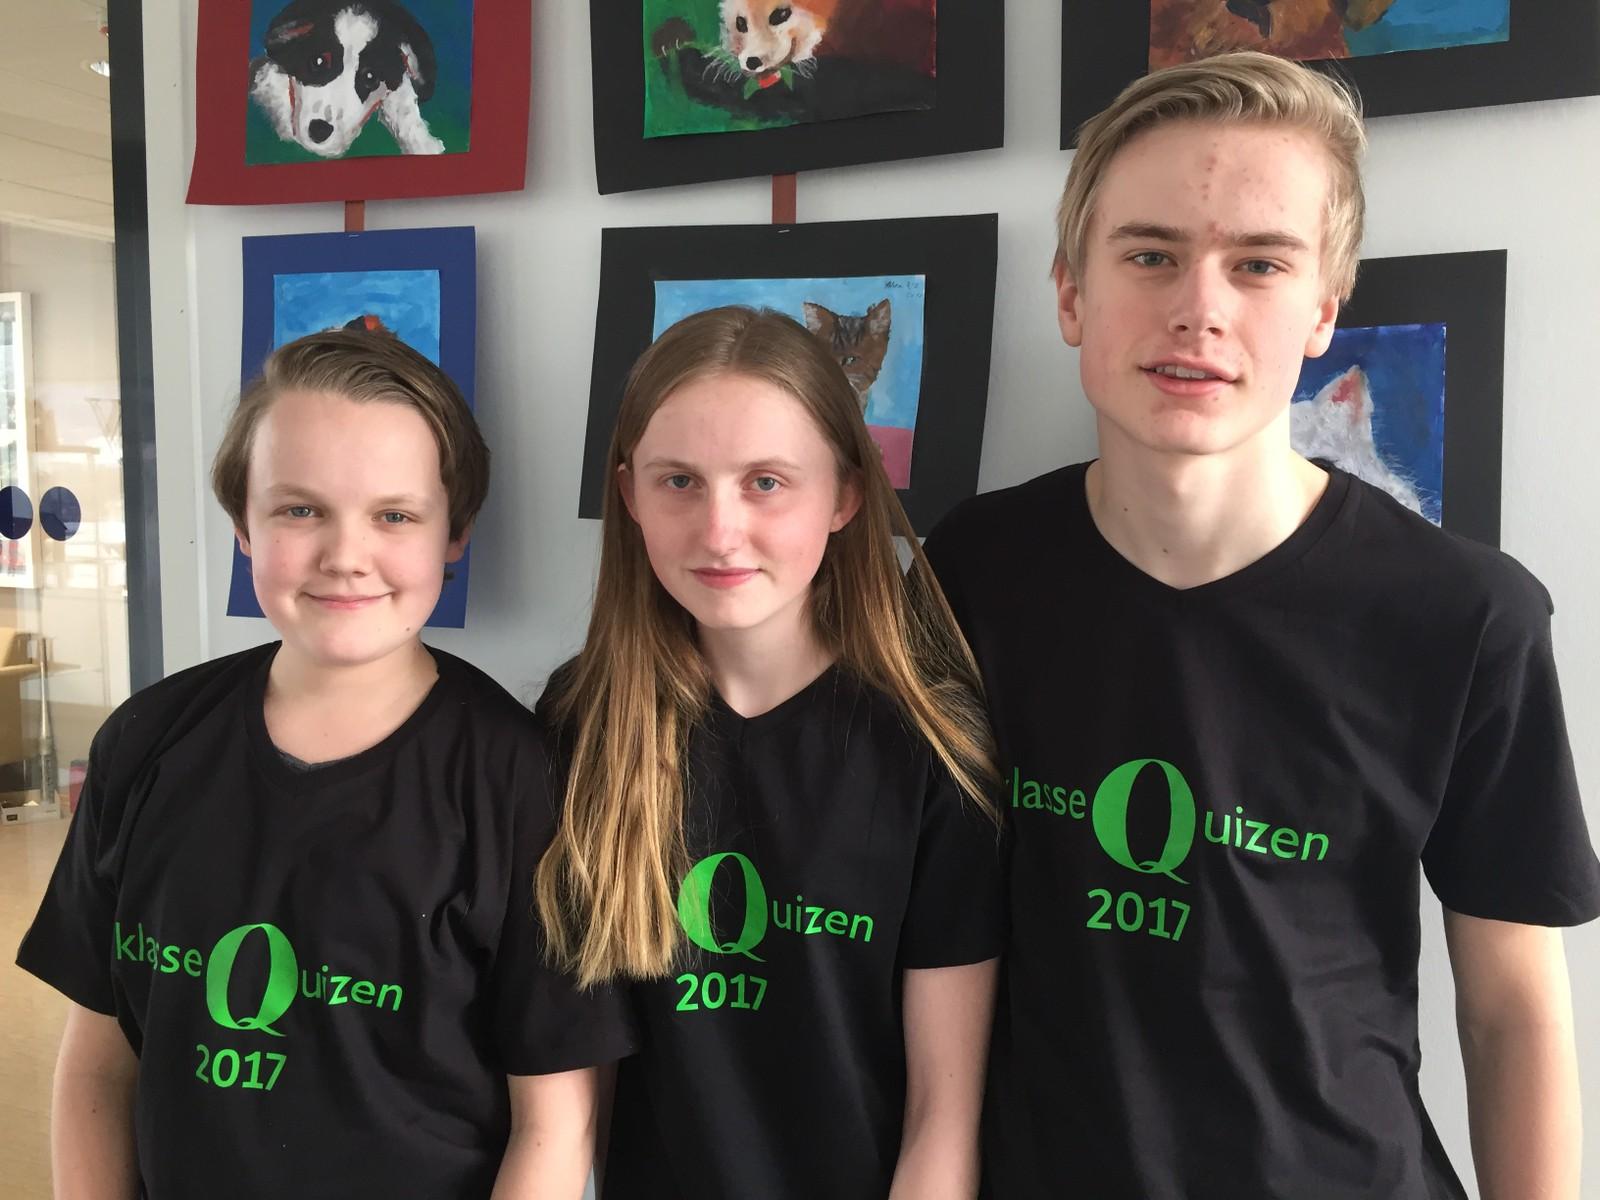 Steffen Magnussen, Aslaug Seim Gunstad og Ola Sæther fra Jevnaker skole klarte 10 poeng.